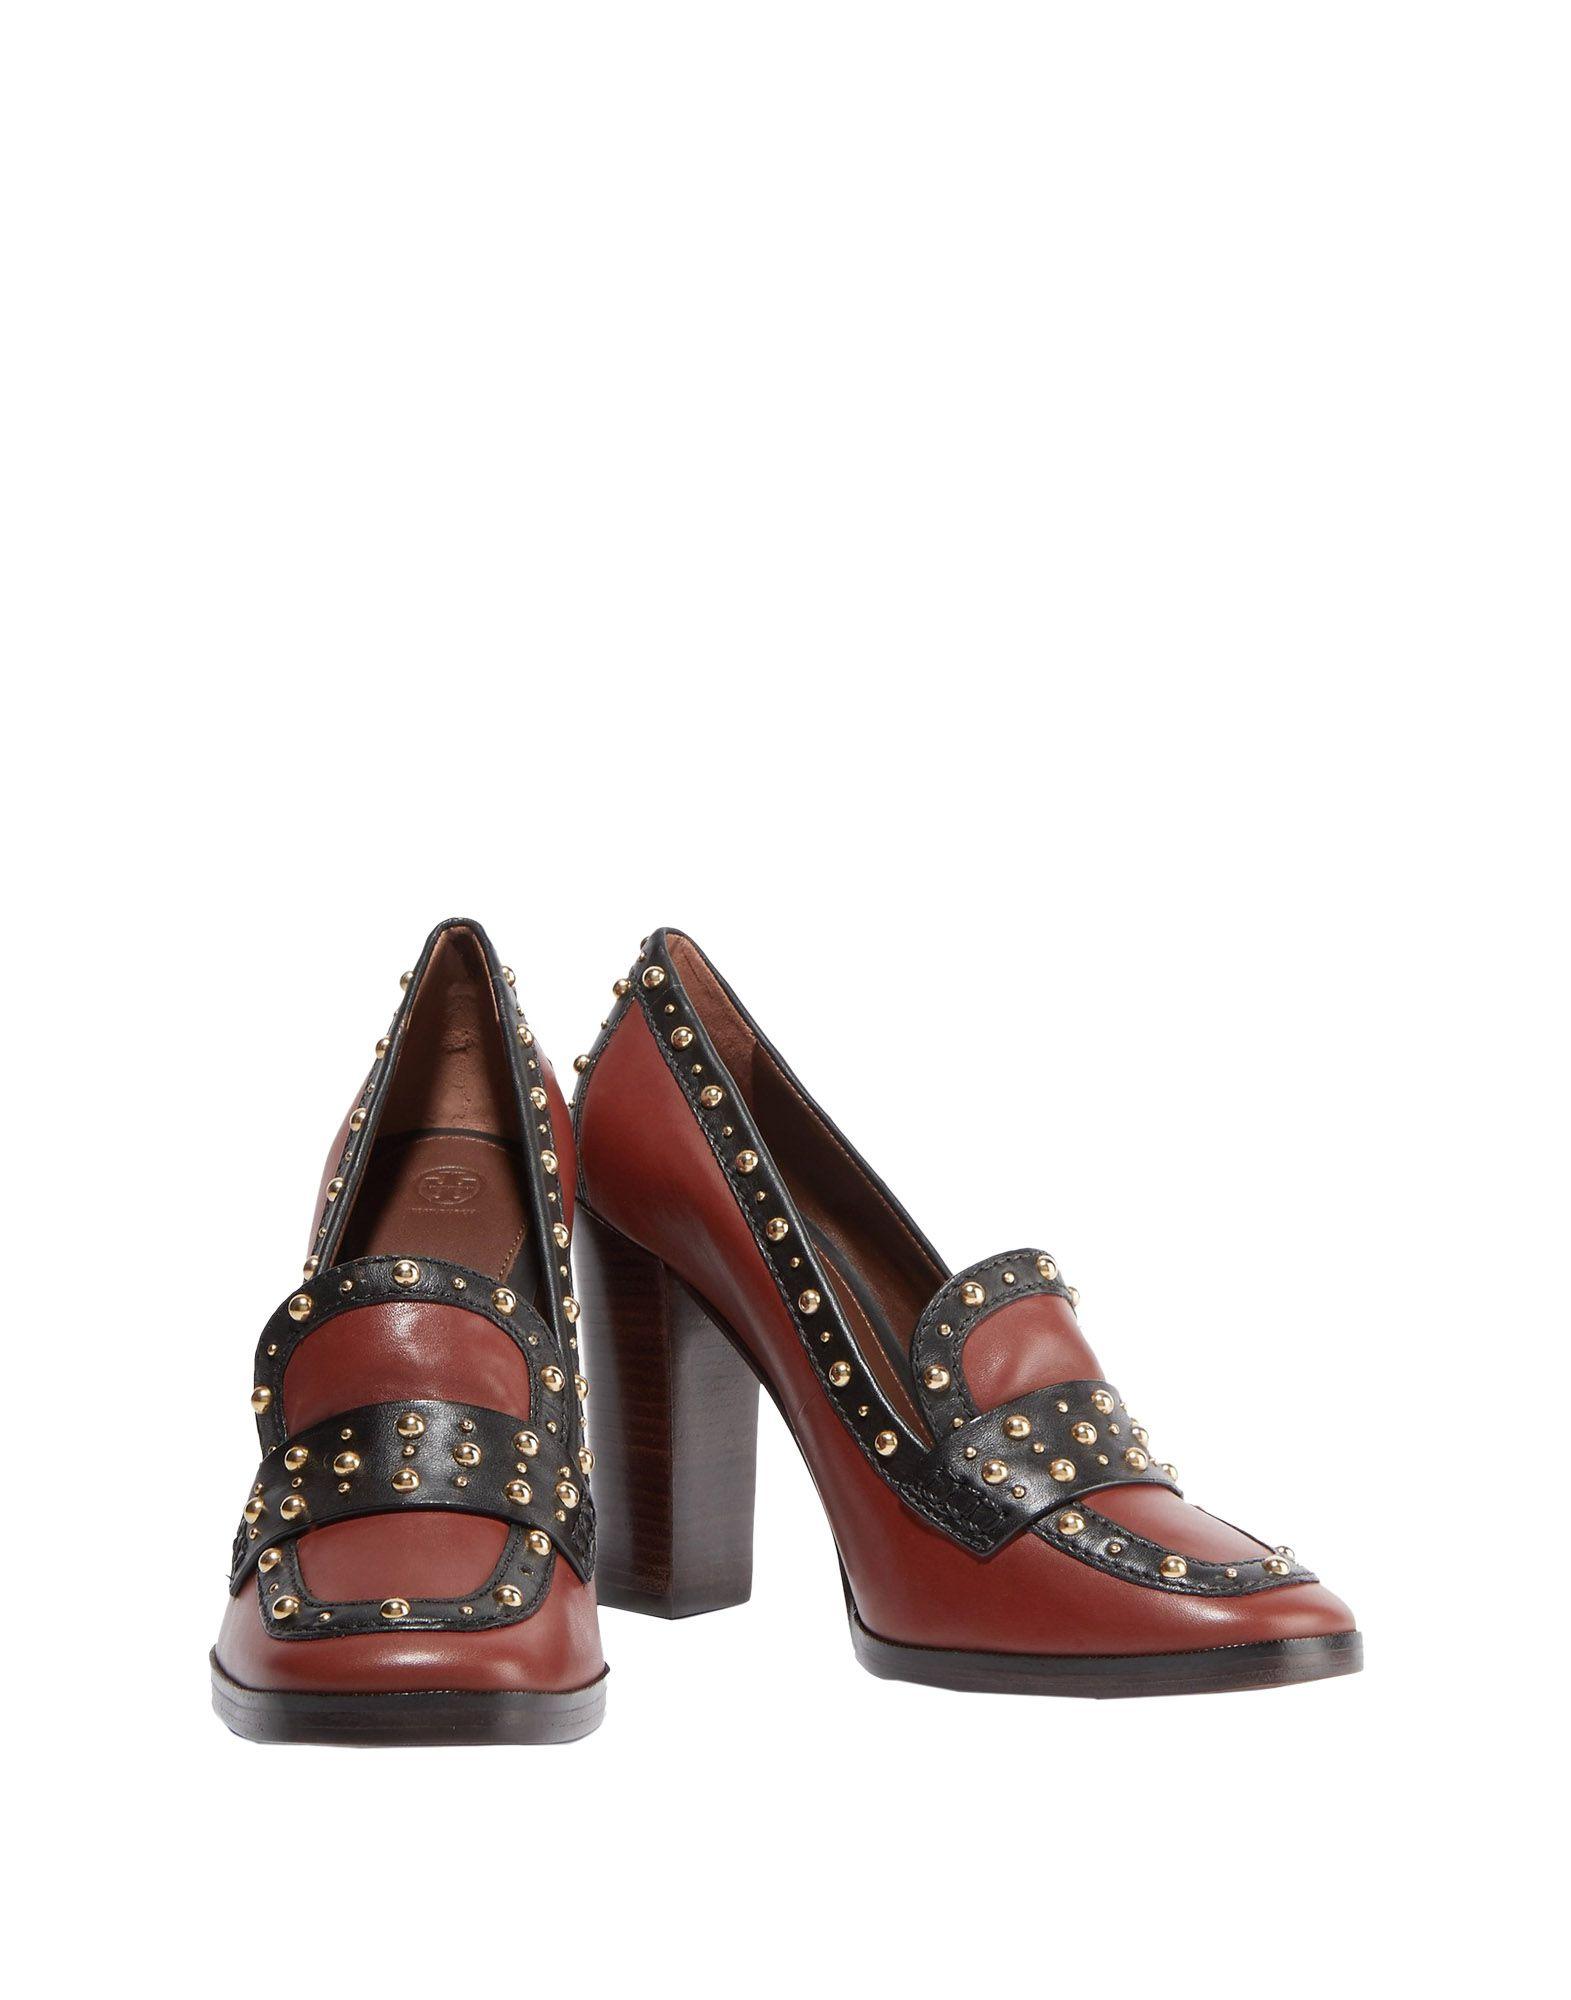 Tory Burch Mokassins Damen  11519645LPGut aussehende strapazierfähige Schuhe